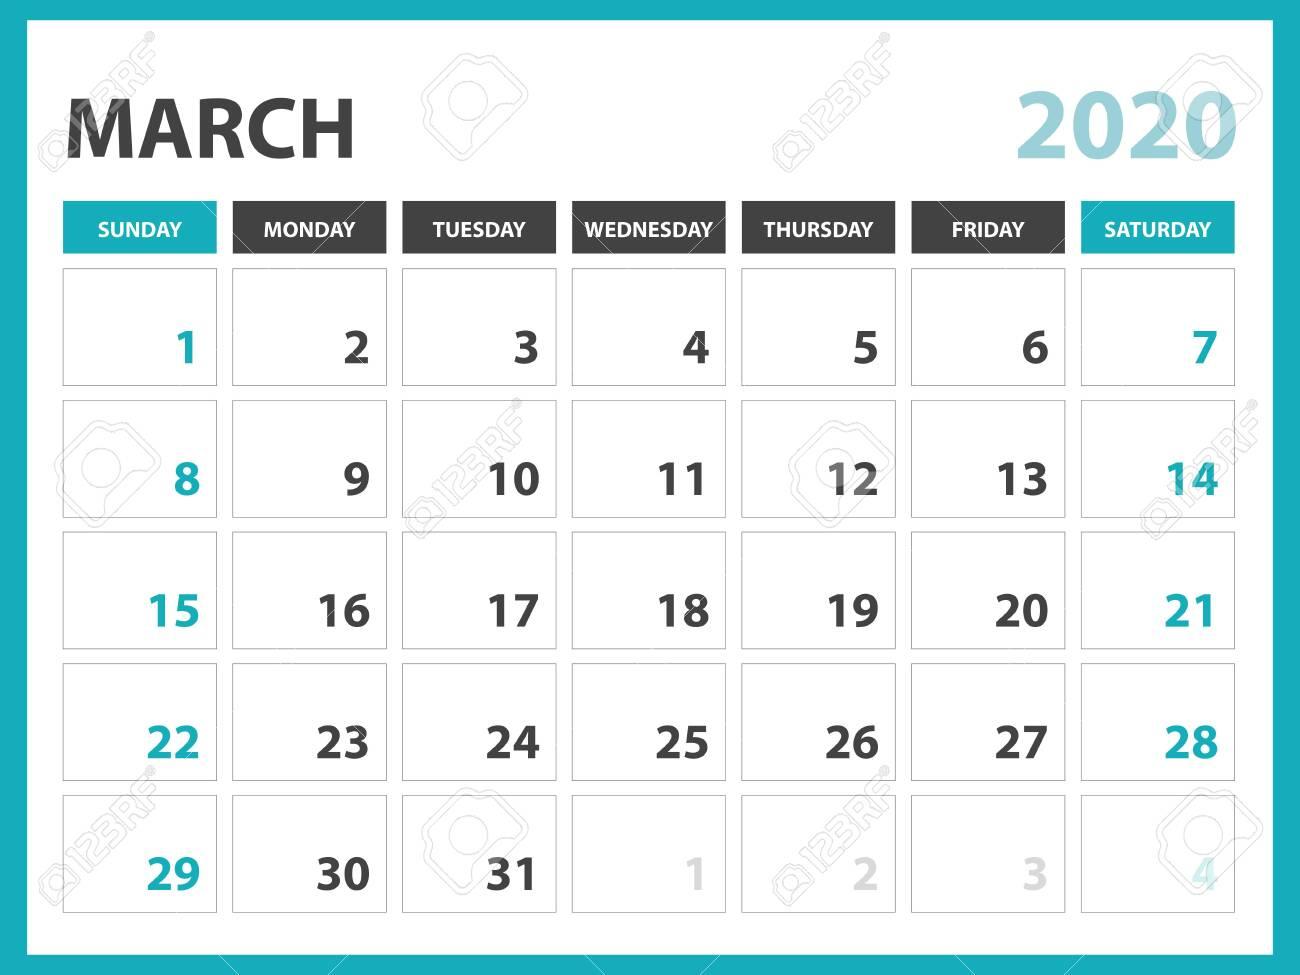 Desk Calendar Layout Size 8 X 6 Inch, March 2020 Calendar Template,..